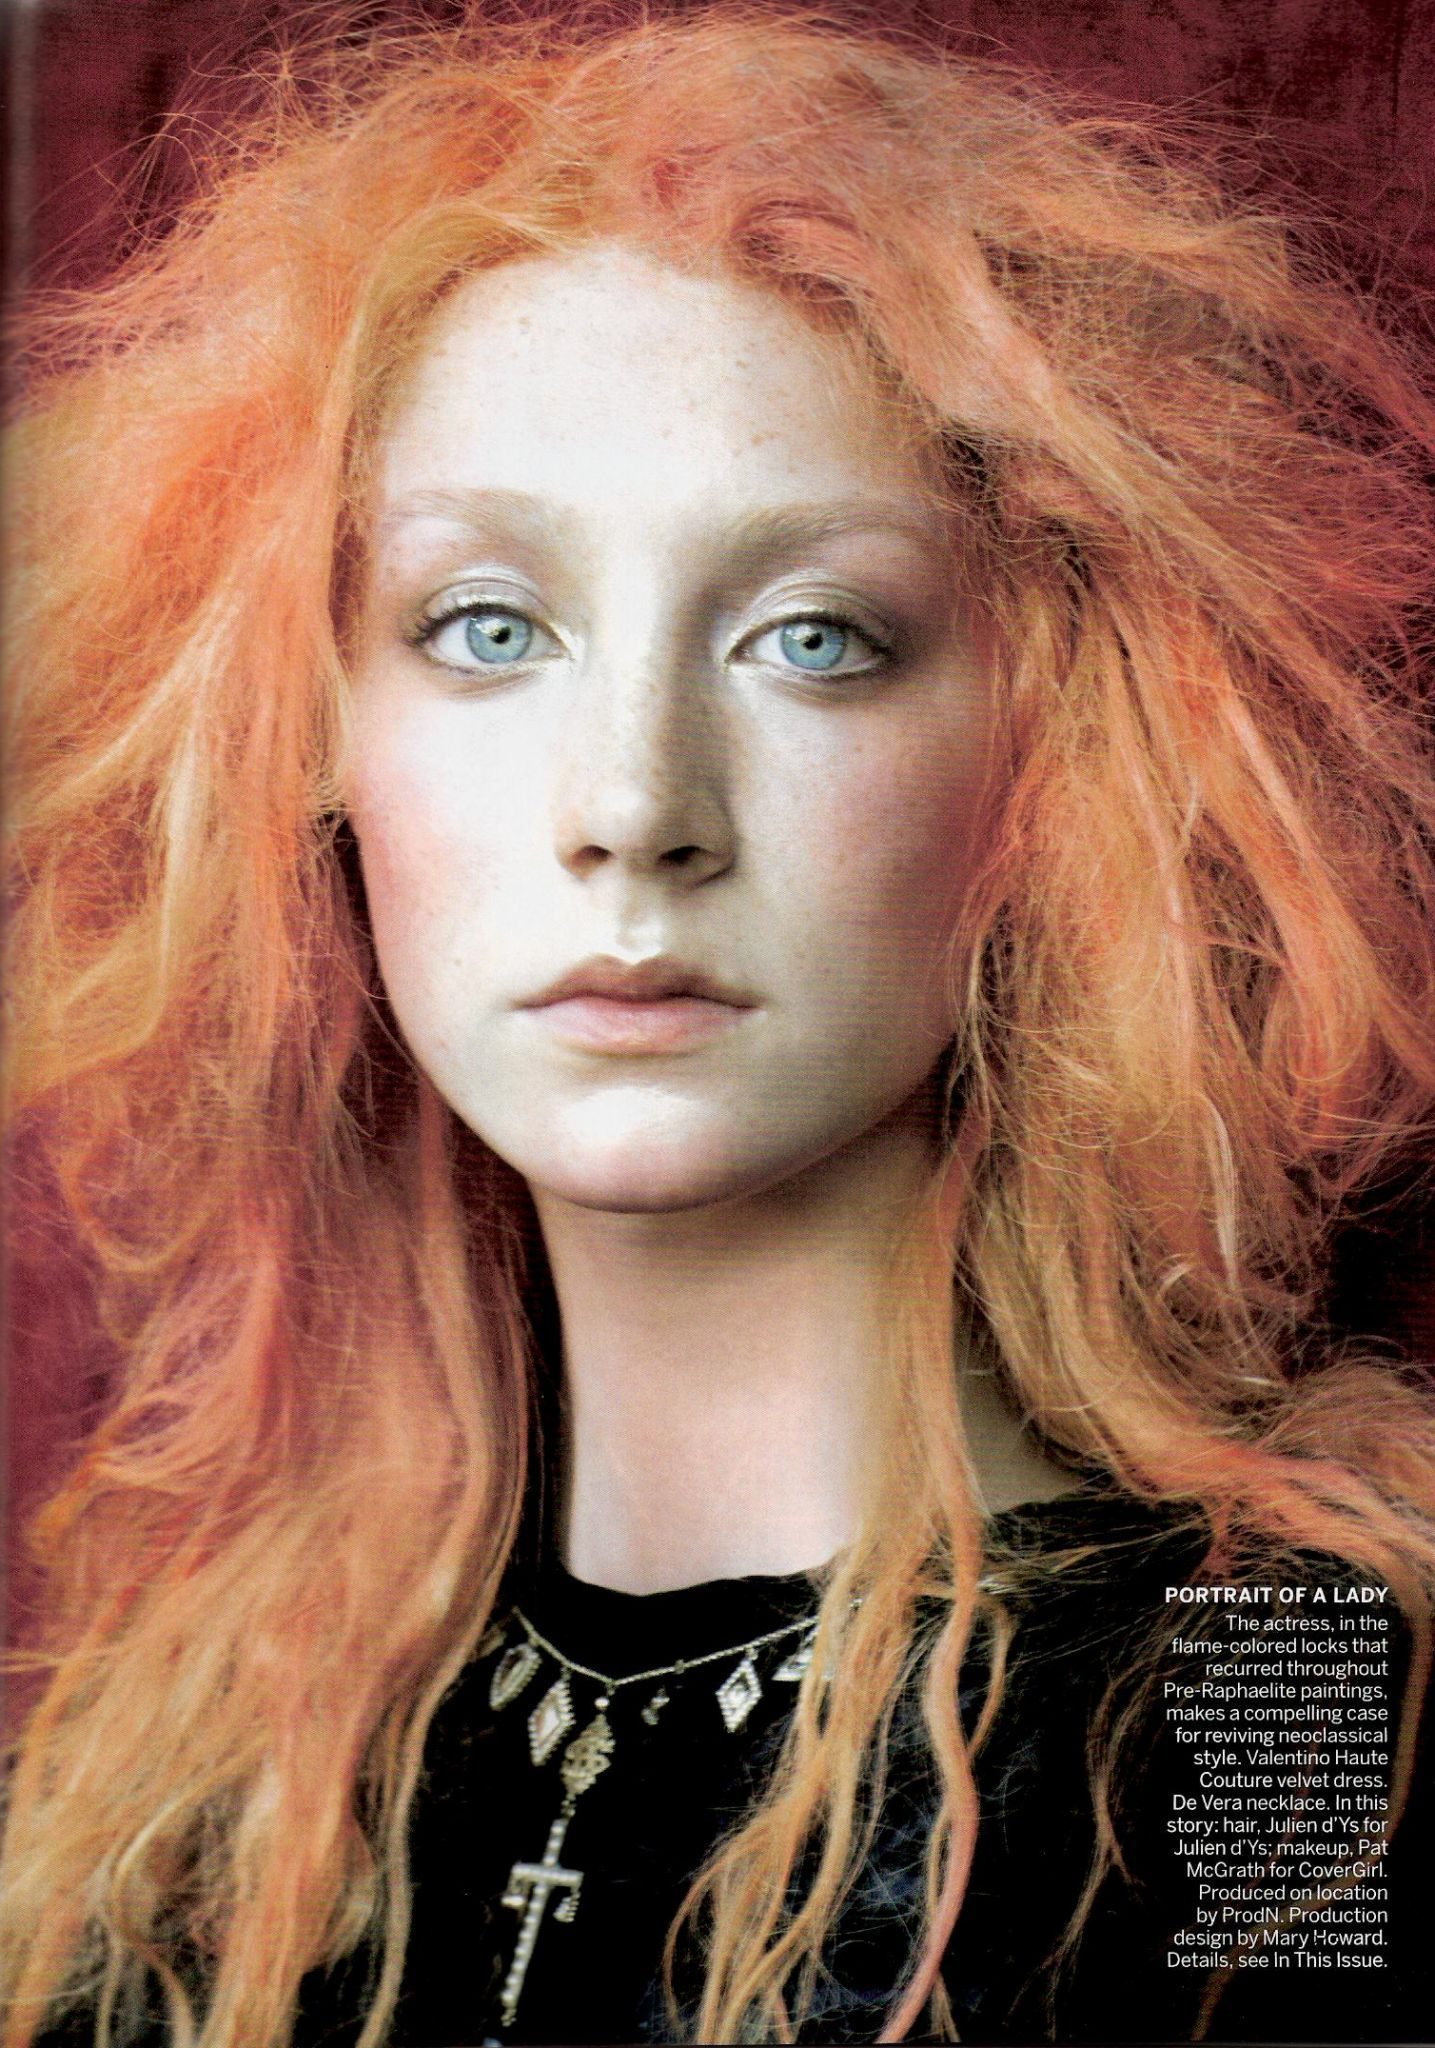 People Models Saoirse Ronan Hair Redhead Faces Steven Meisel Pre Raphaelite Interesting Faces